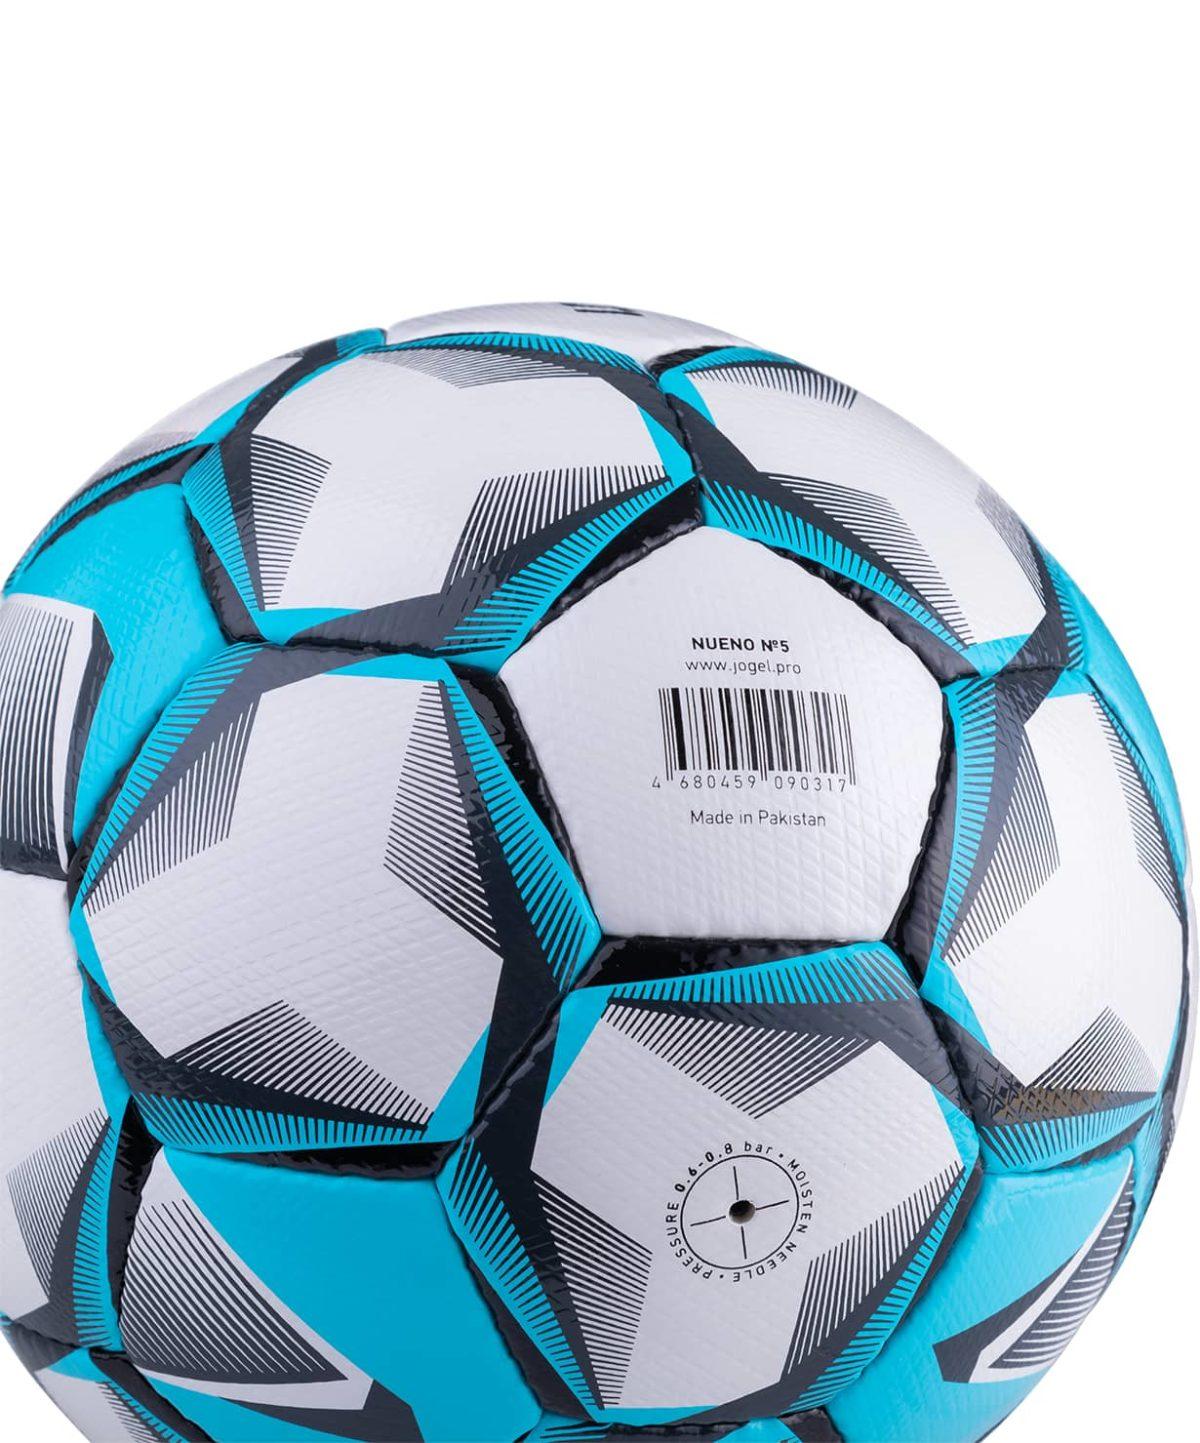 JOGEL Nueno Мяч футбольный  Nueno №5 (BC-20) - 4